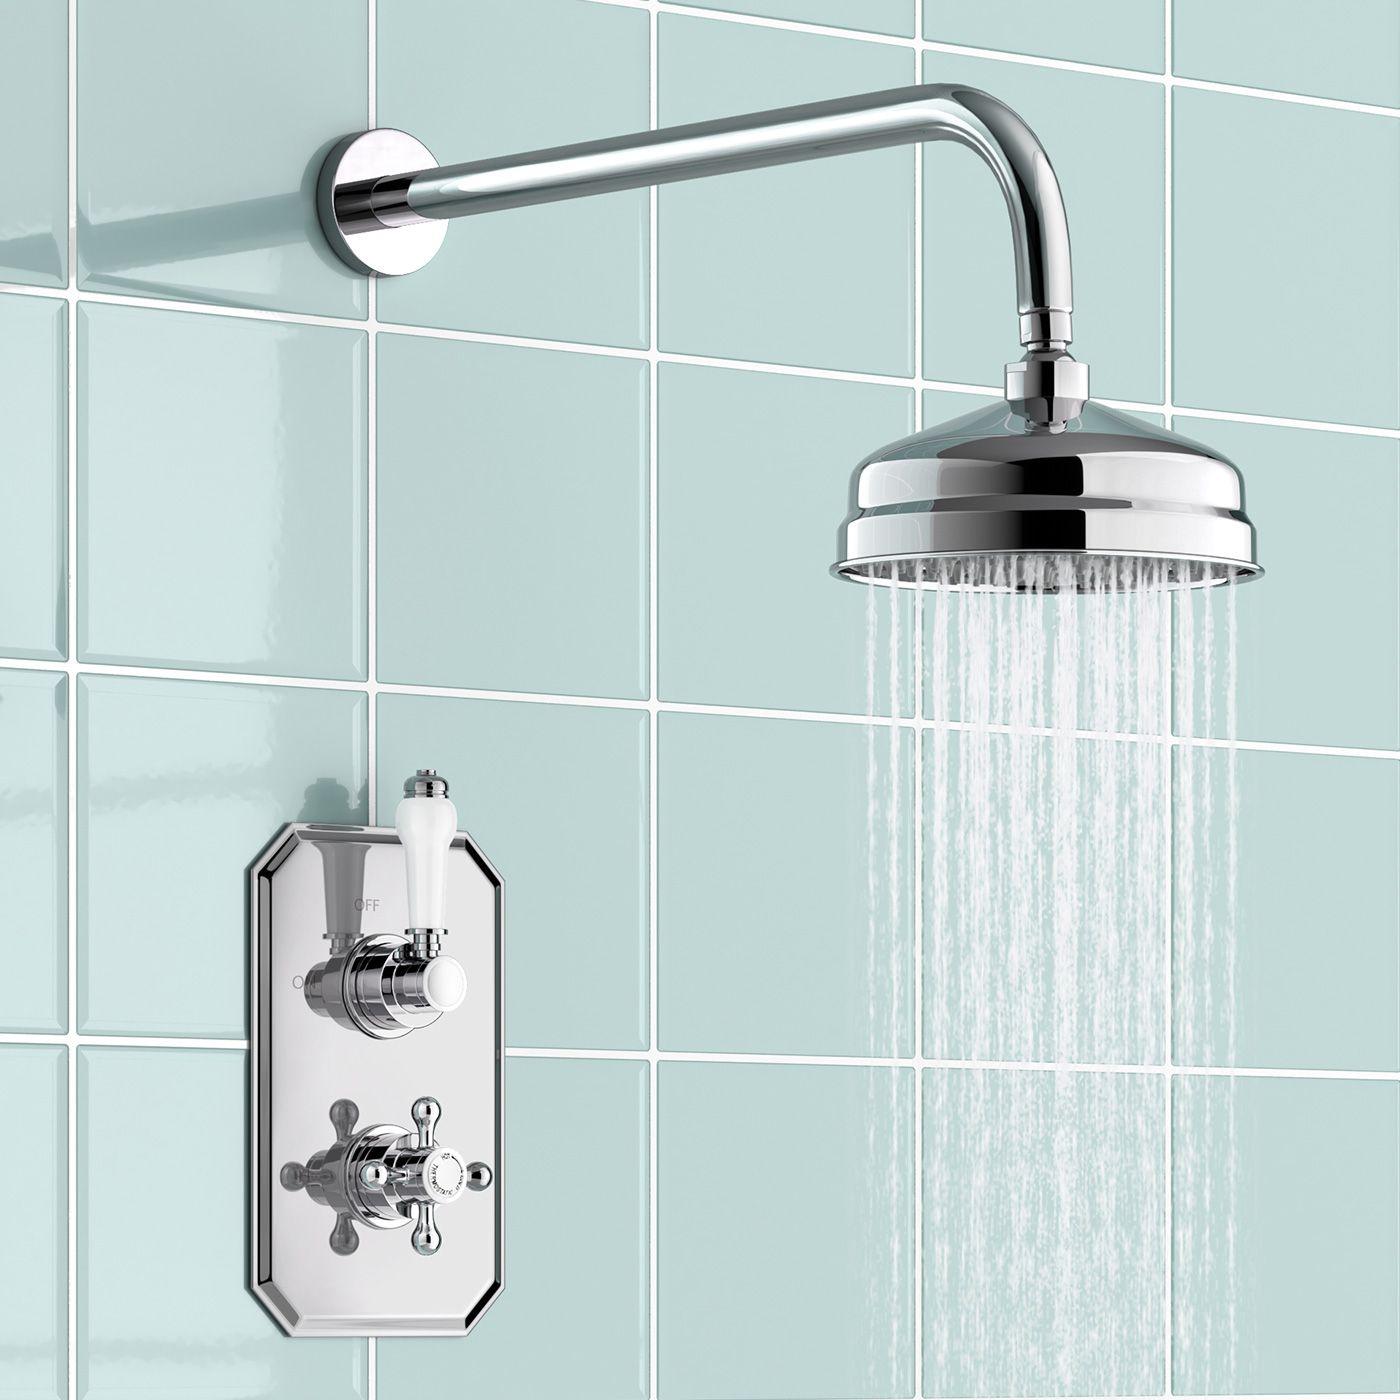 Pin by Shaun Nolan on Home Improvements - Bathrooms | Pinterest ...